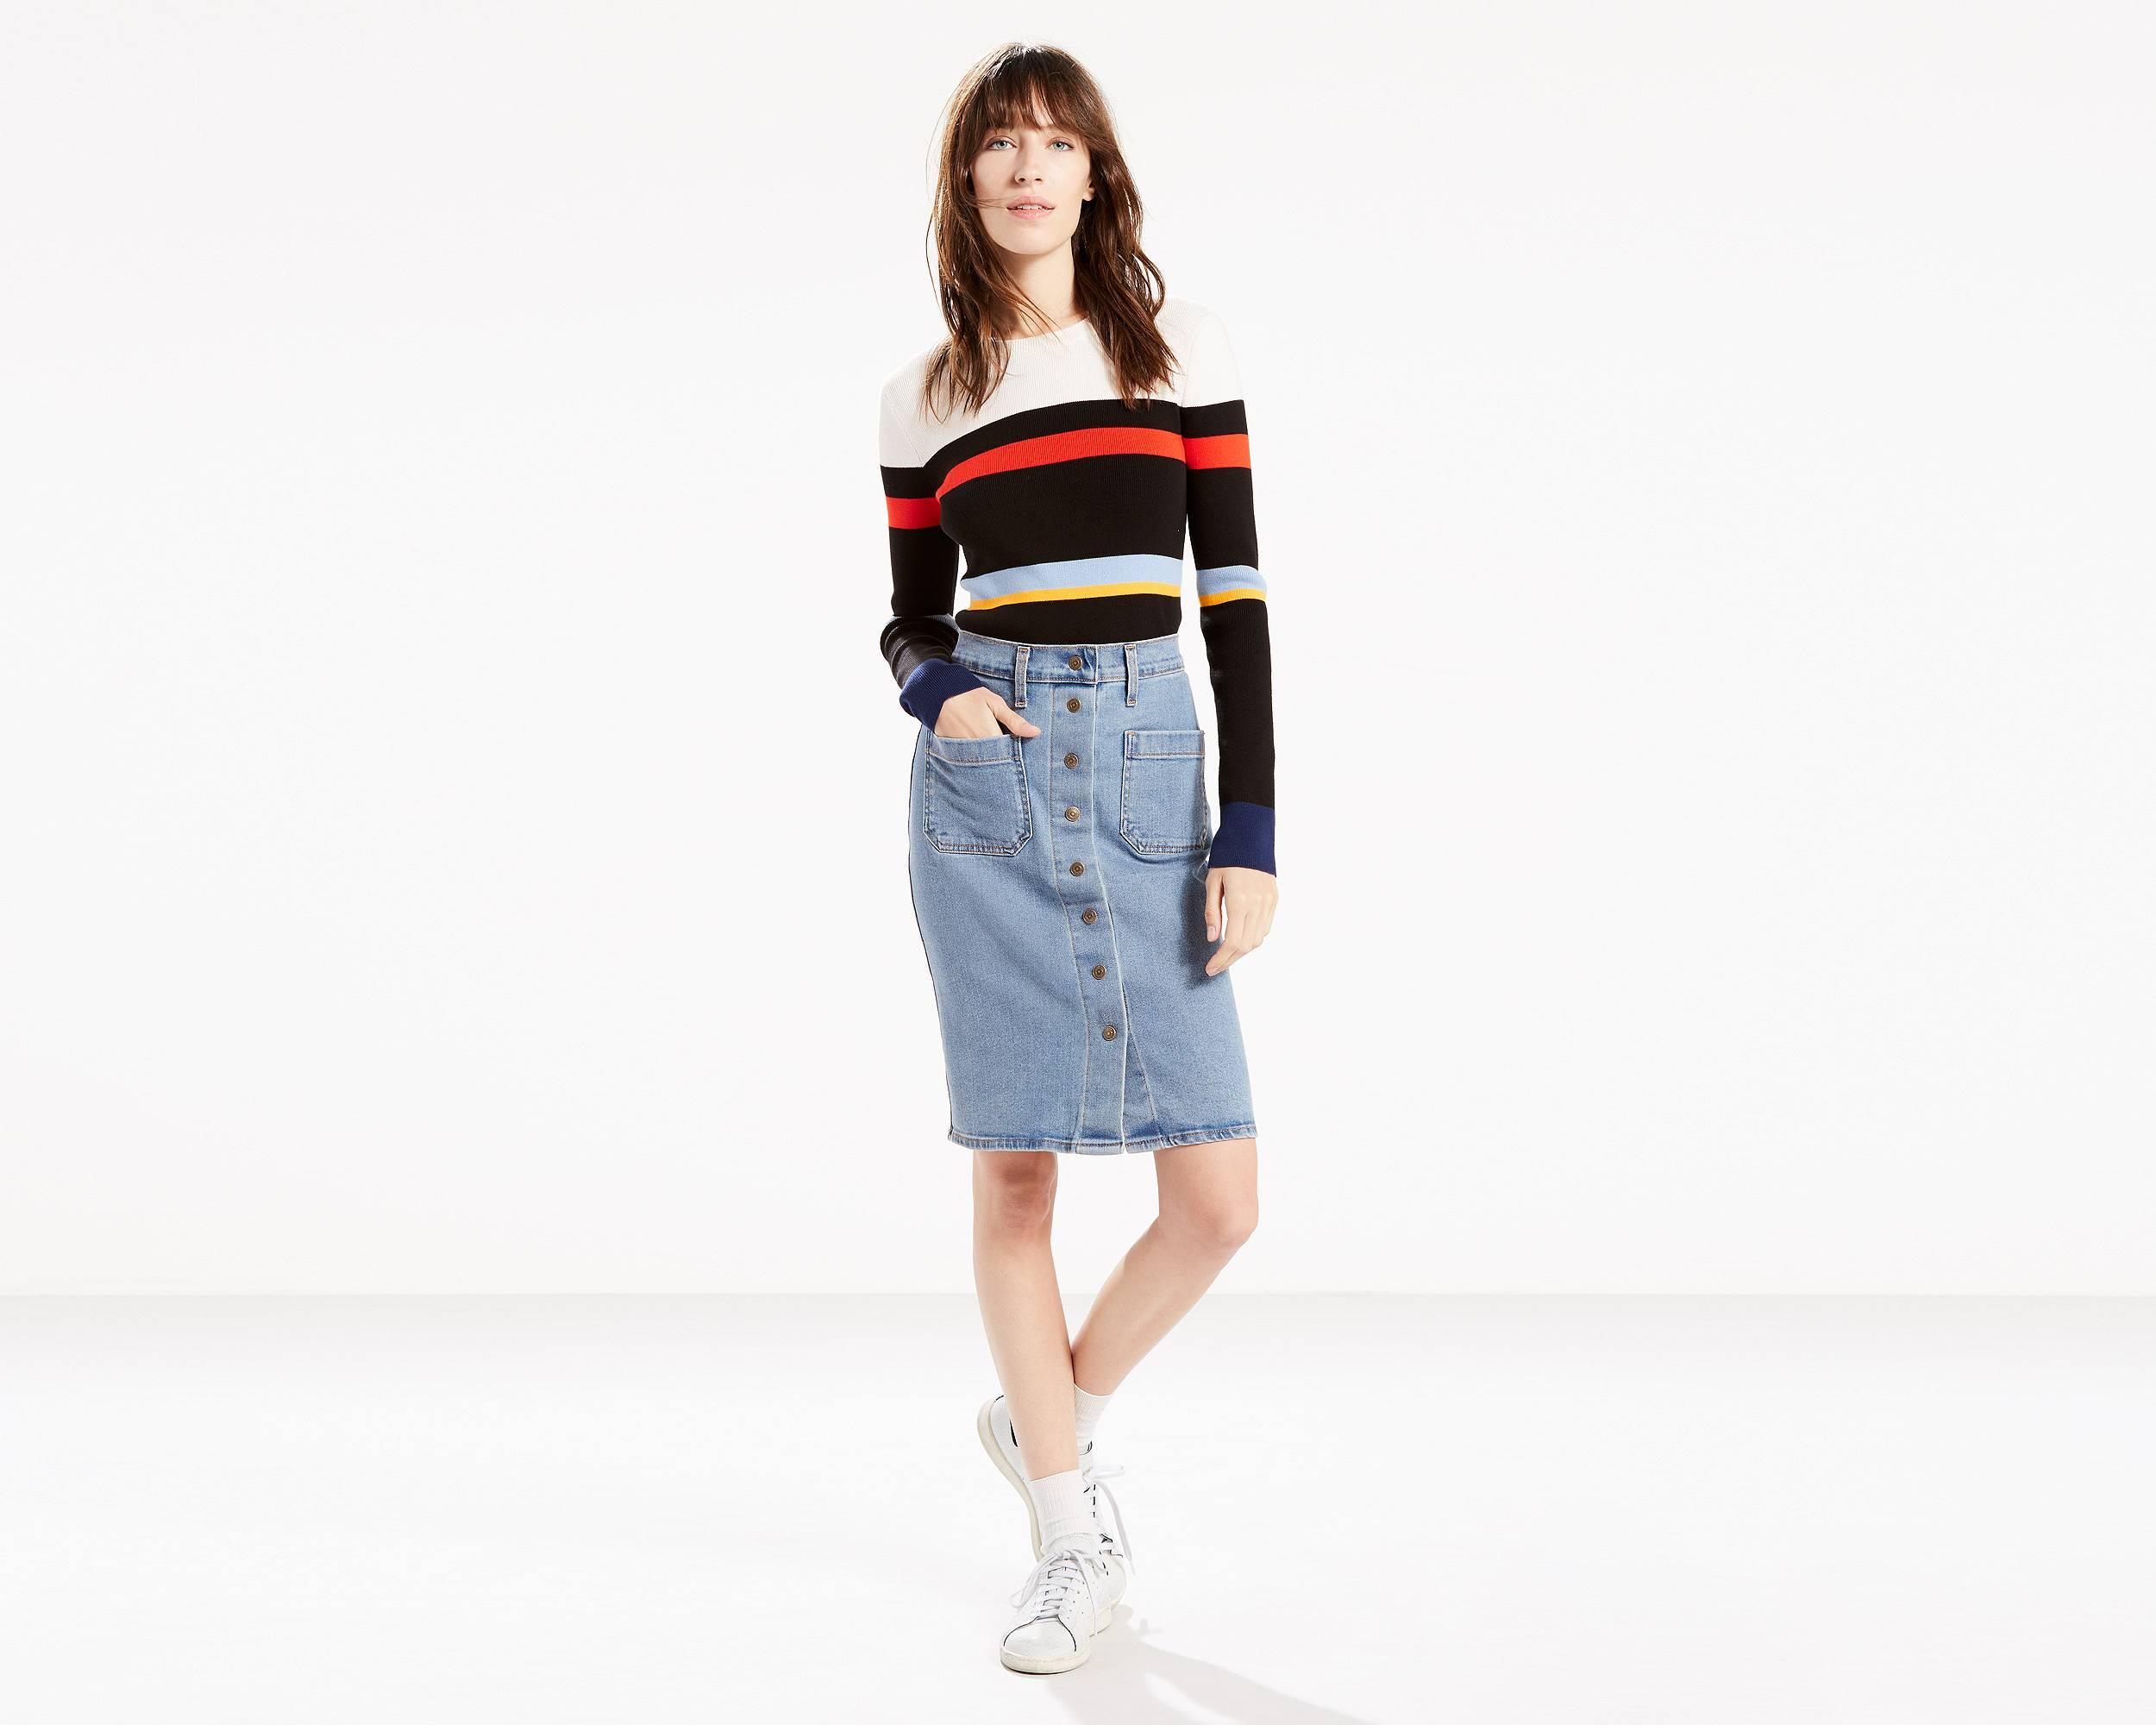 Denim Skirts & Dresses - Shop this Season's Jean Skirts | Levi's®